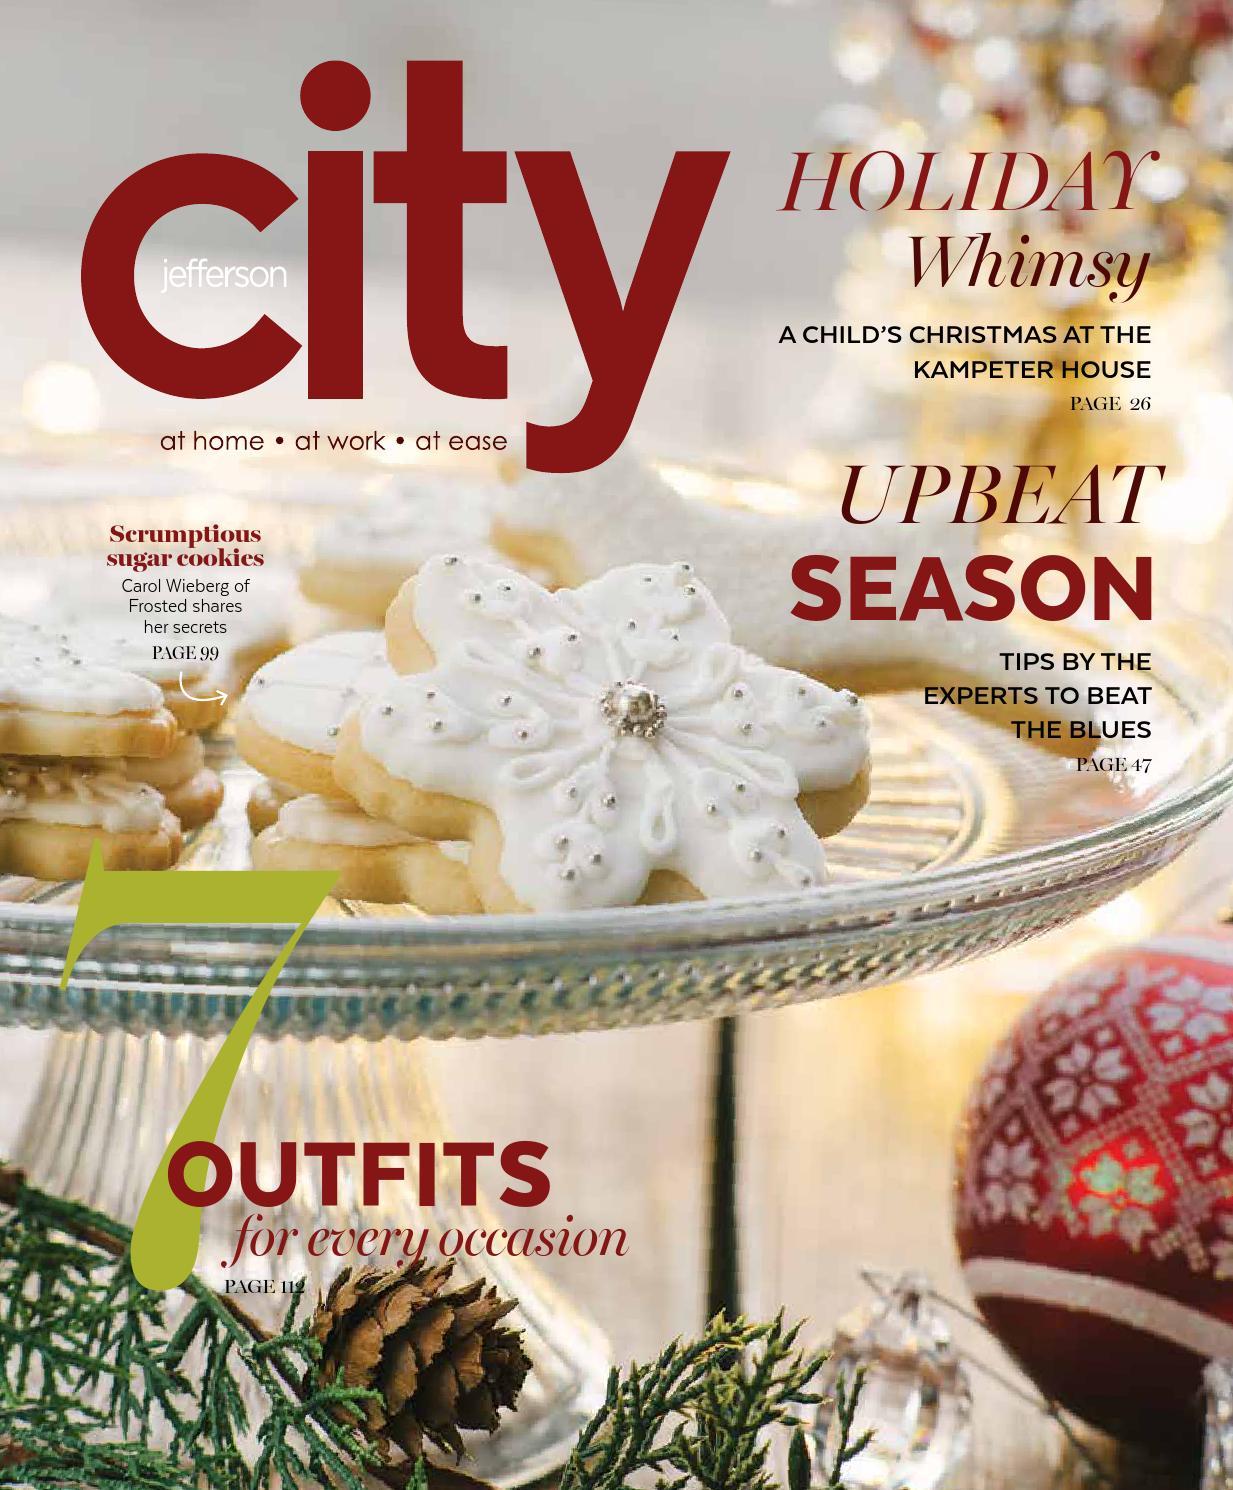 Jefferson City Magazine - November/December 2015 by Business Times Company  - issuu